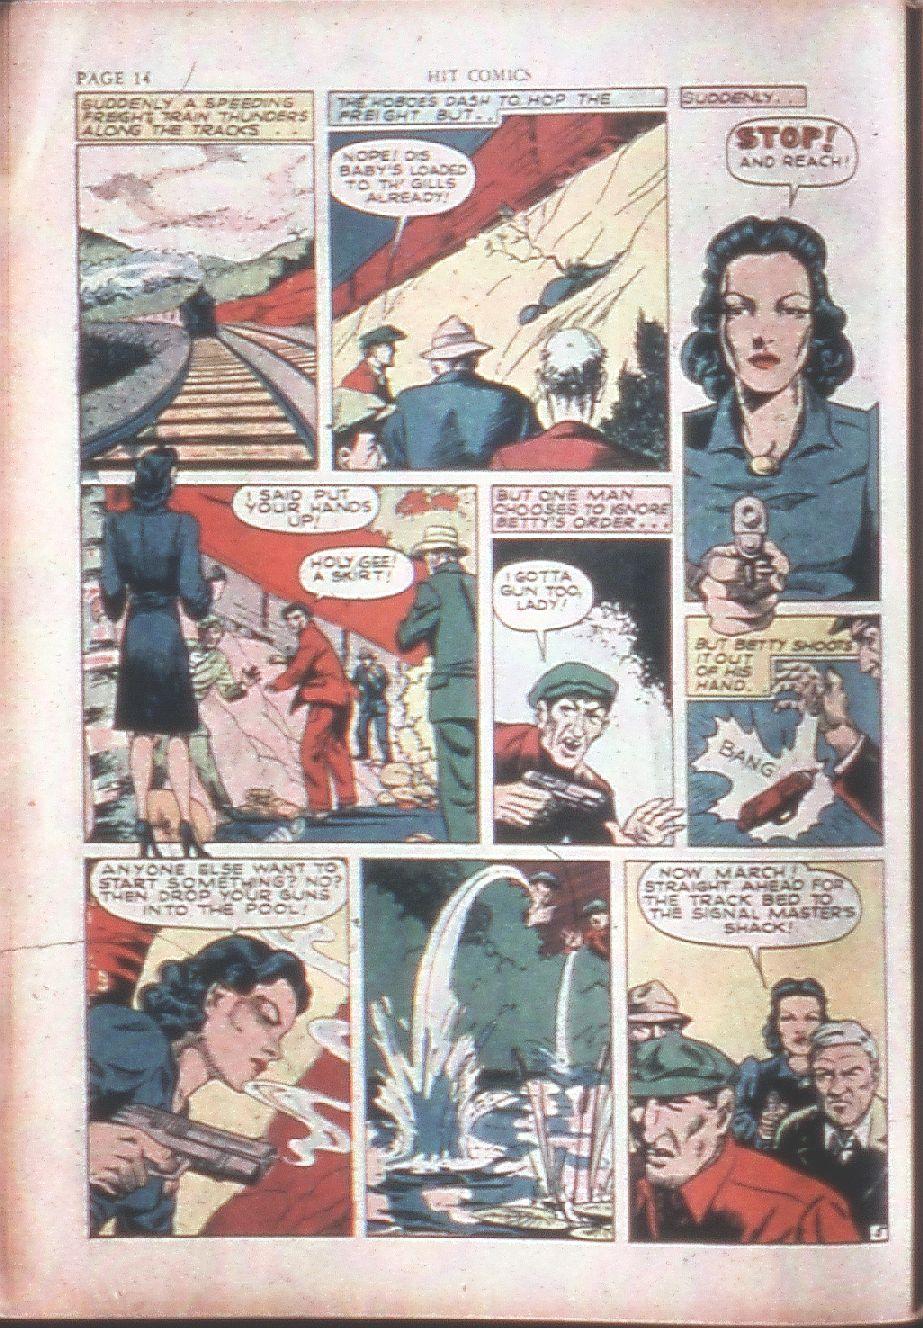 Read online Hit Comics comic -  Issue #15 - 16